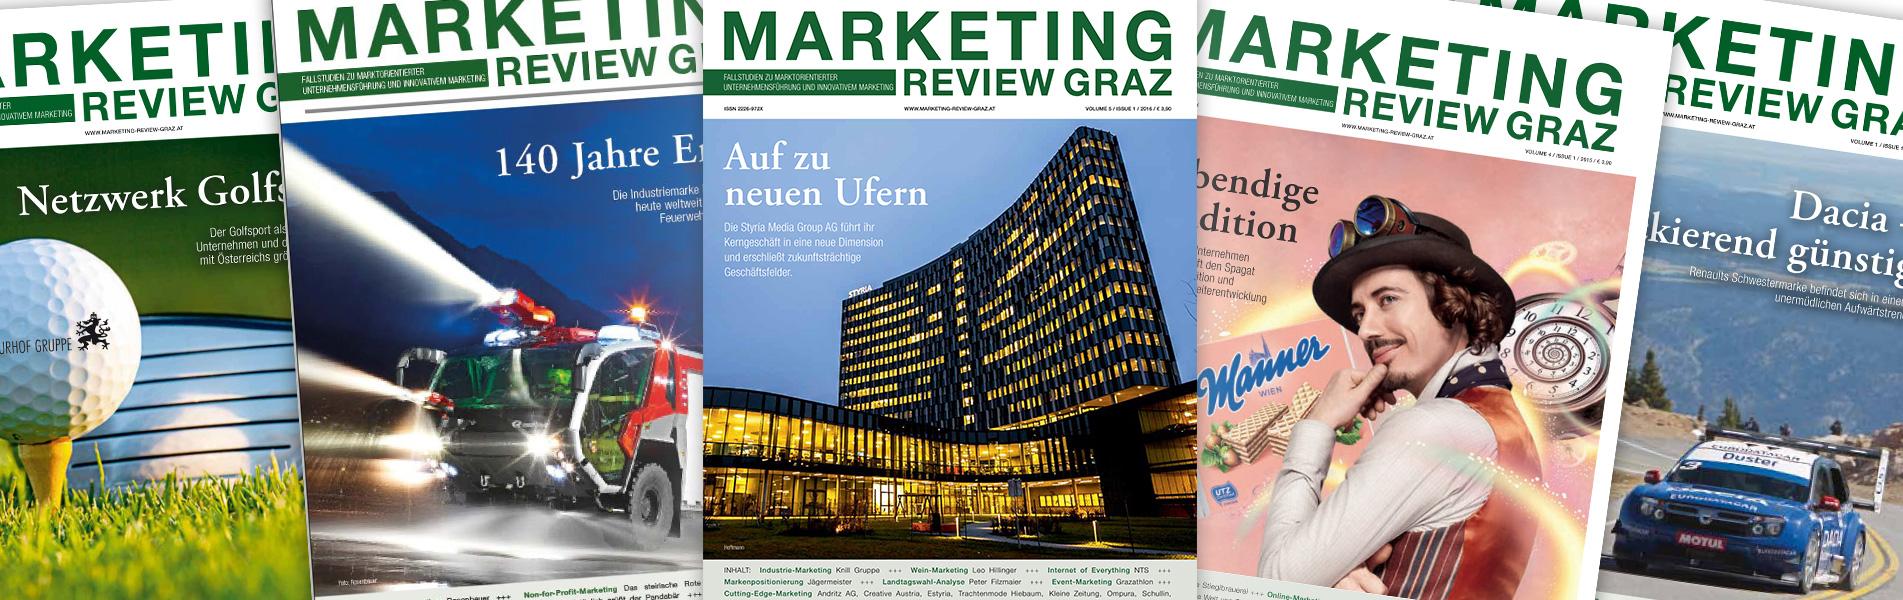 slider-marketing-review-graz